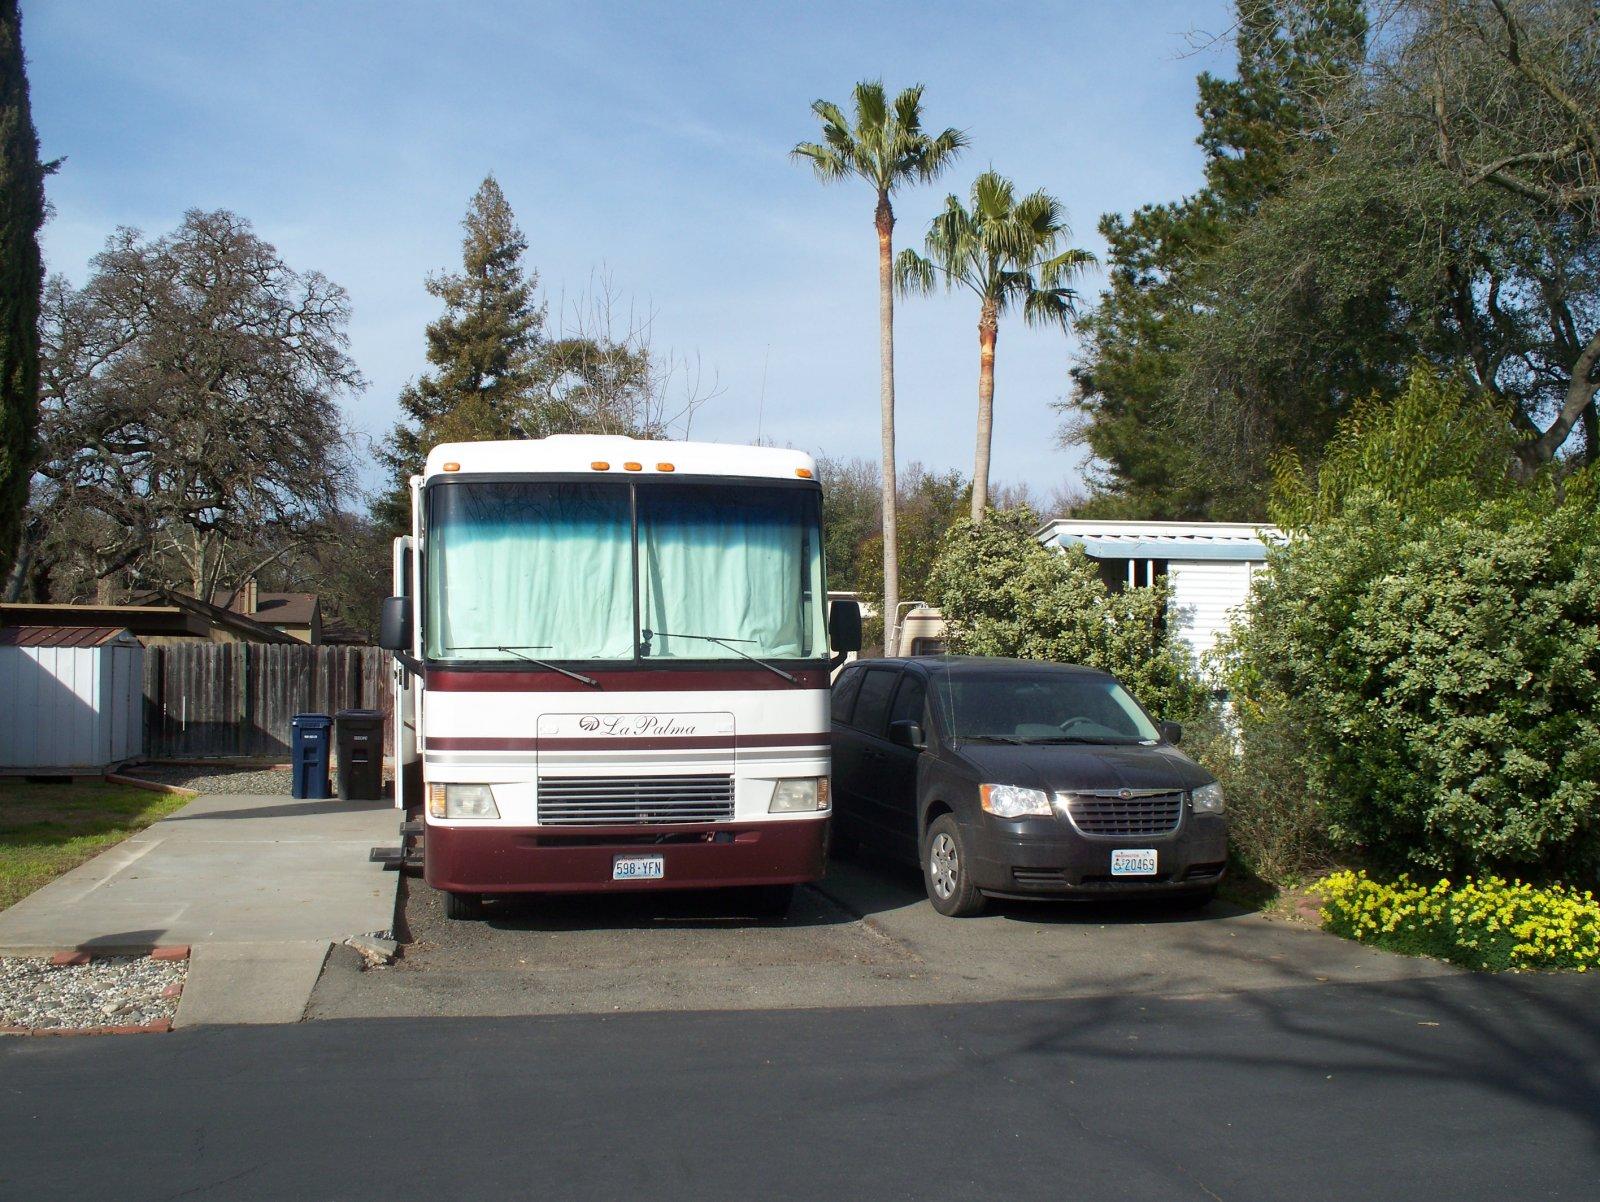 Click image for larger version  Name:Sacramento, CA.jpg Views:79 Size:426.7 KB ID:26245